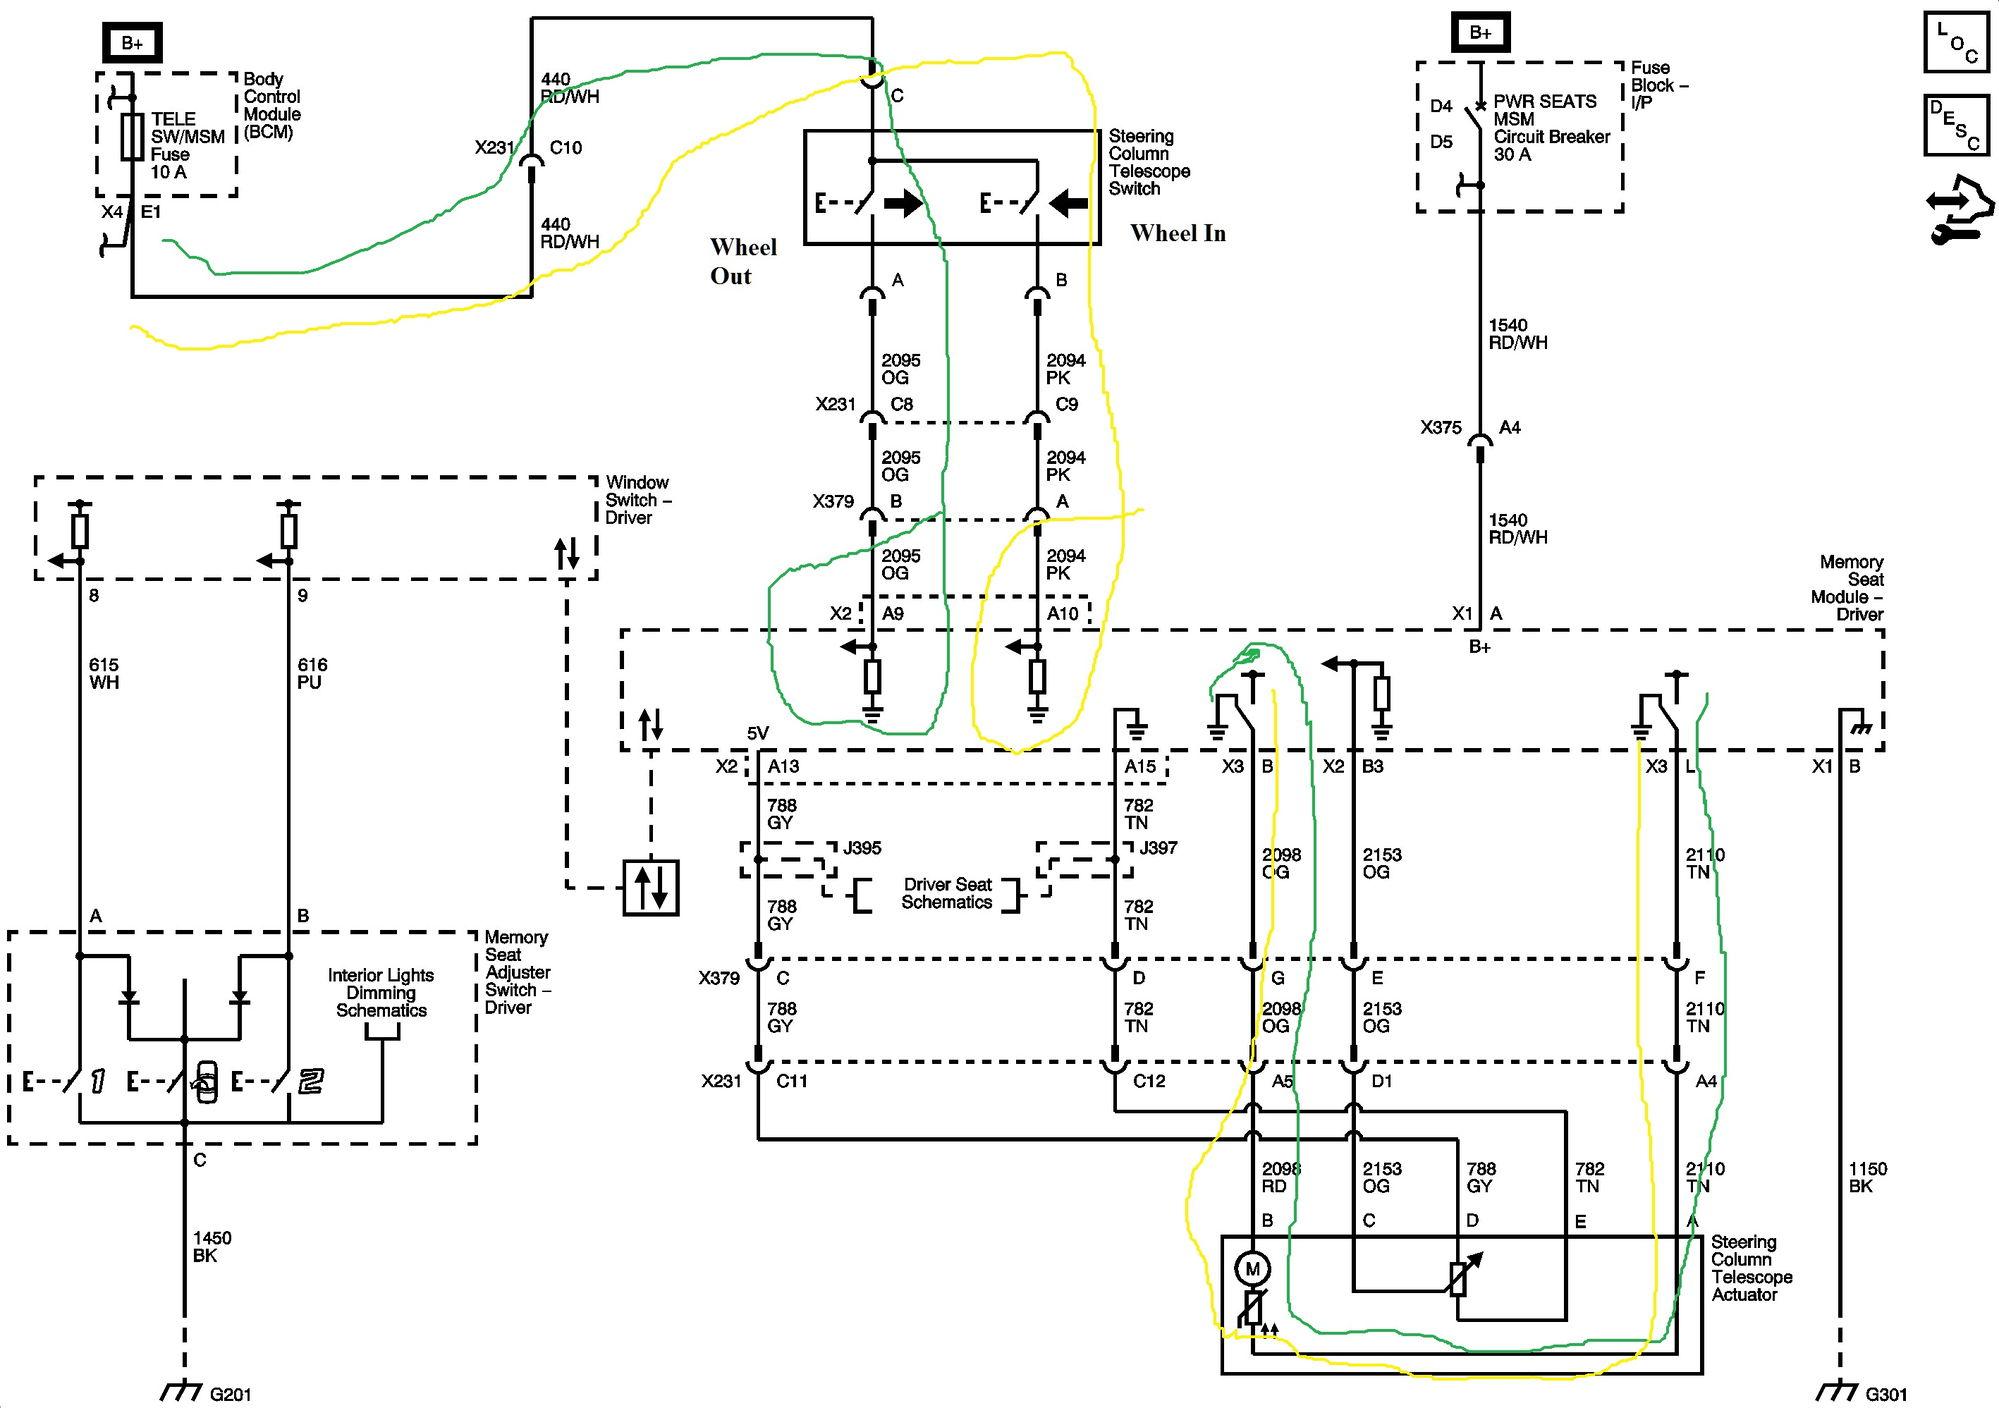 c5 corvette power seat wiring diagram 2008 cobalt stereo tele harness bass elsalvadorla